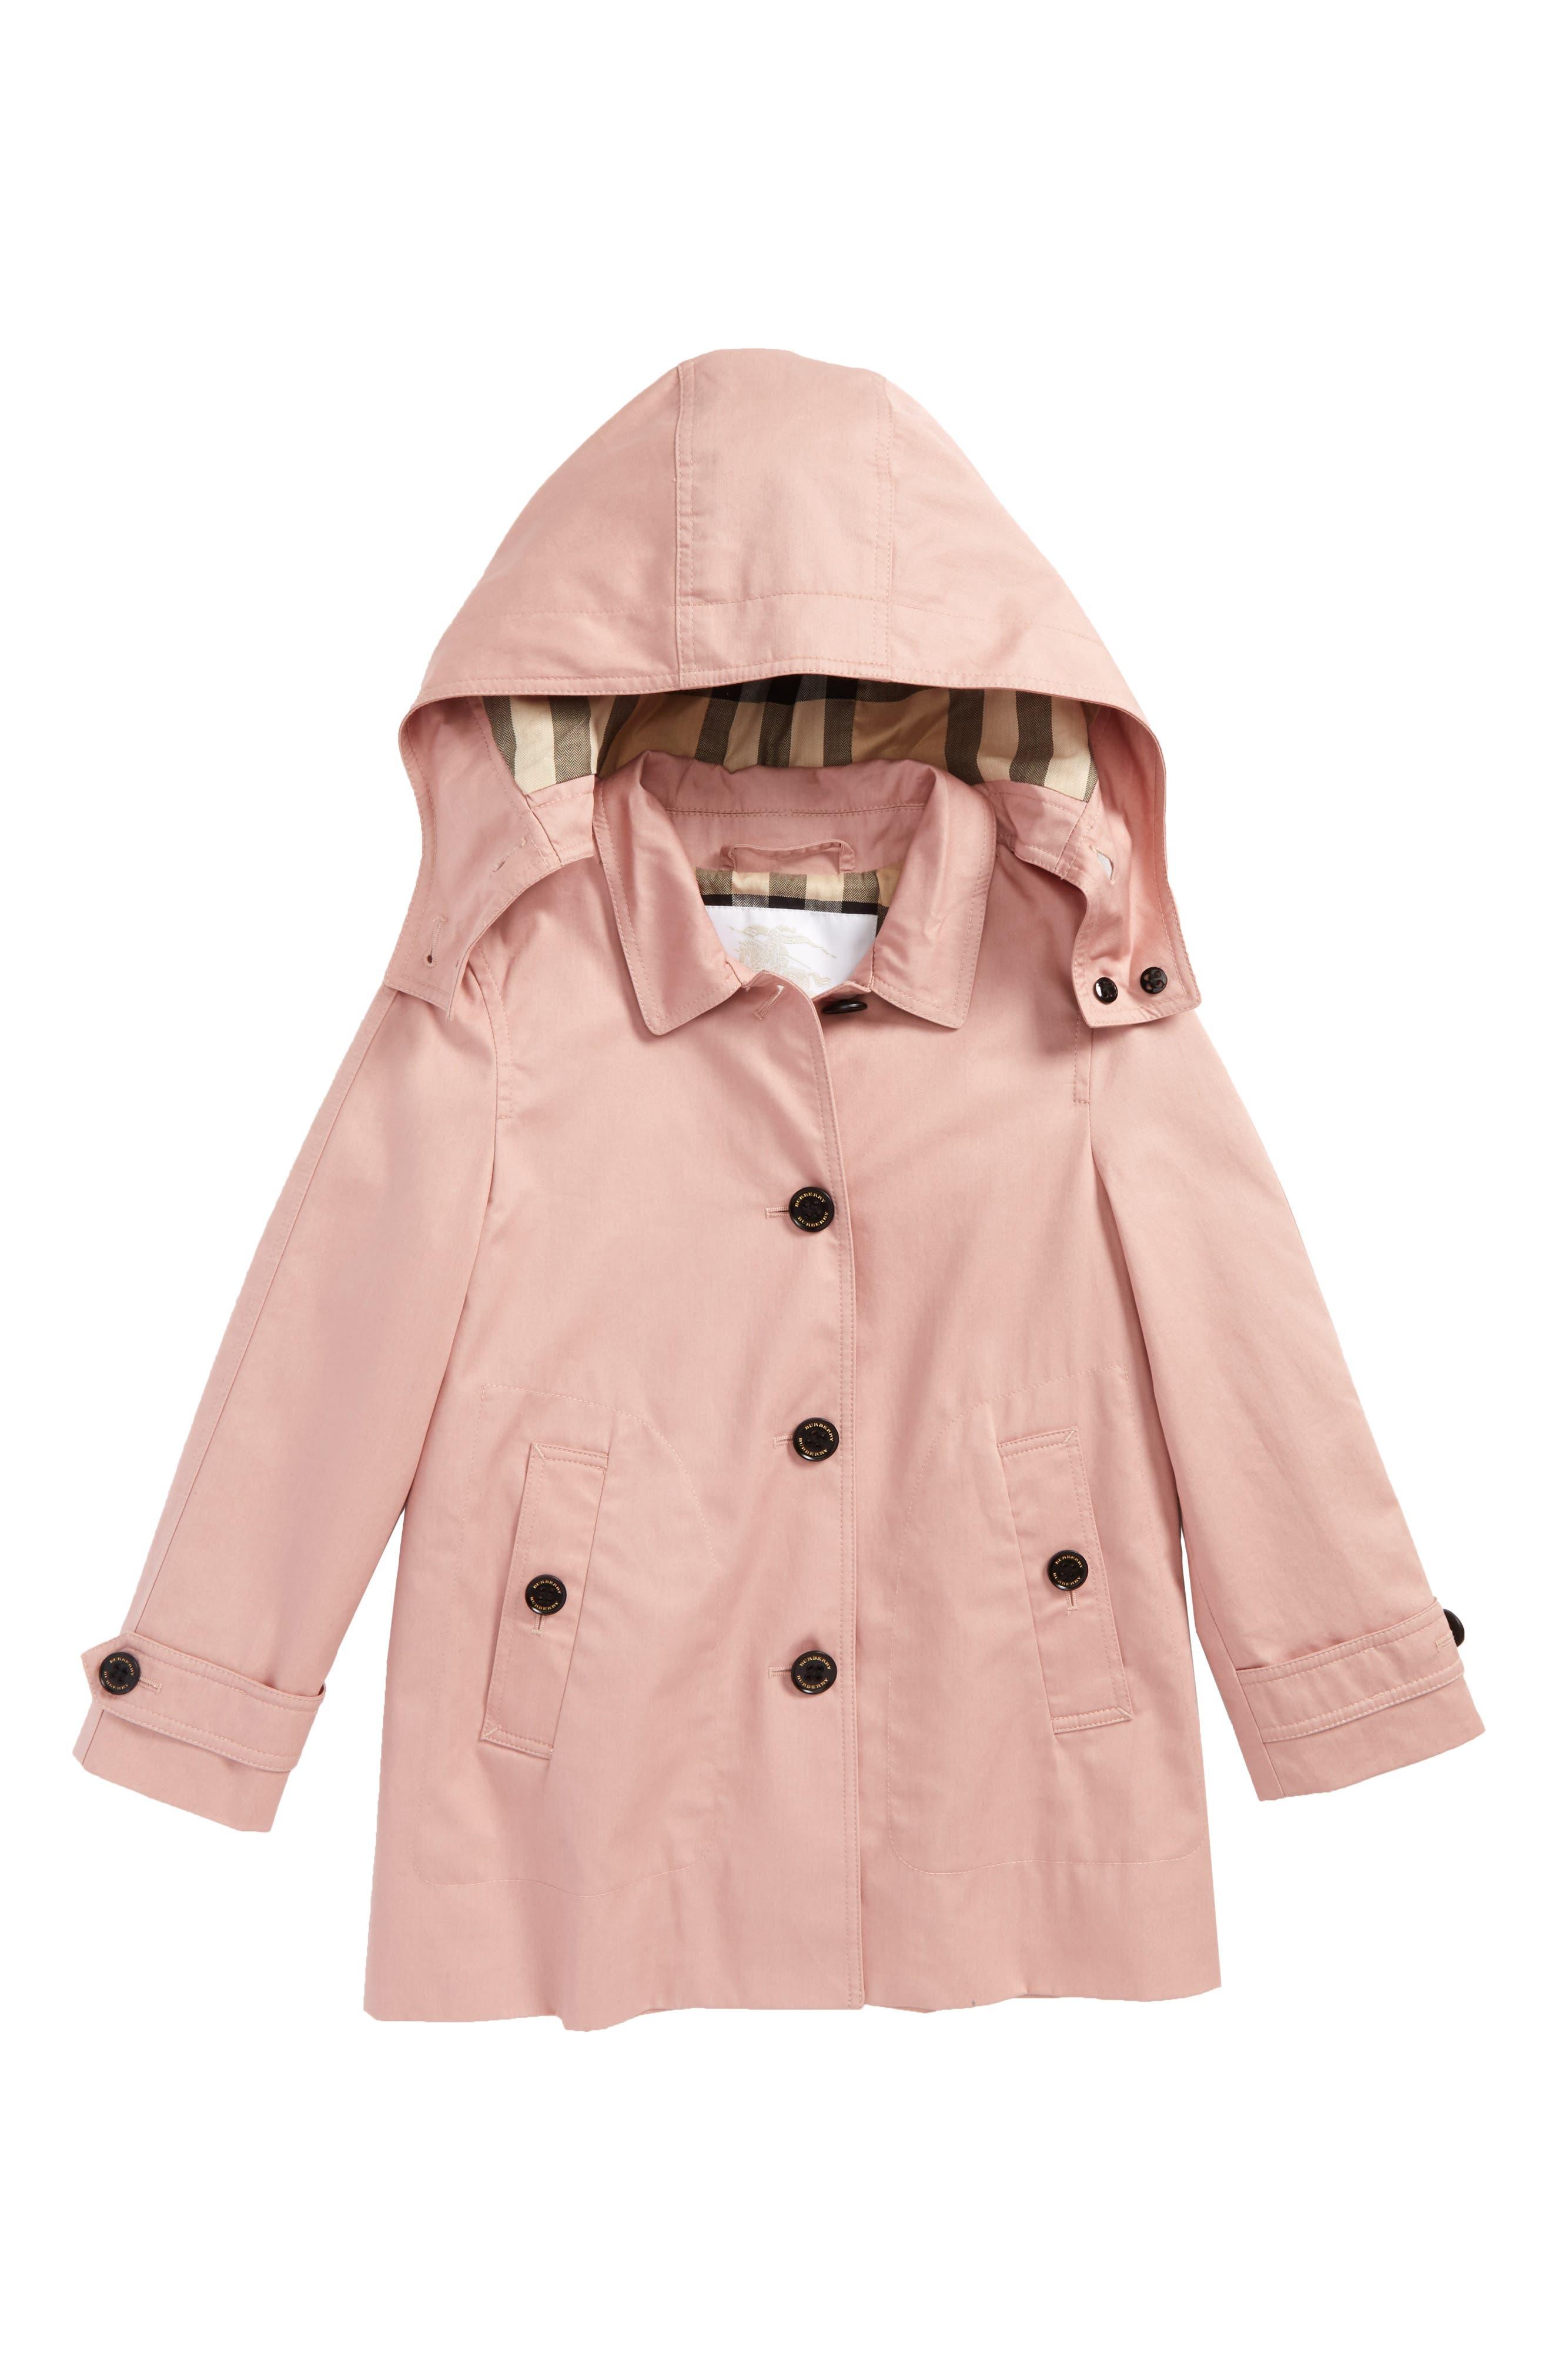 Alternate Image 1 Selected - Burberry Geri Hooded Trench Coat (Little Girls & Big Girls)